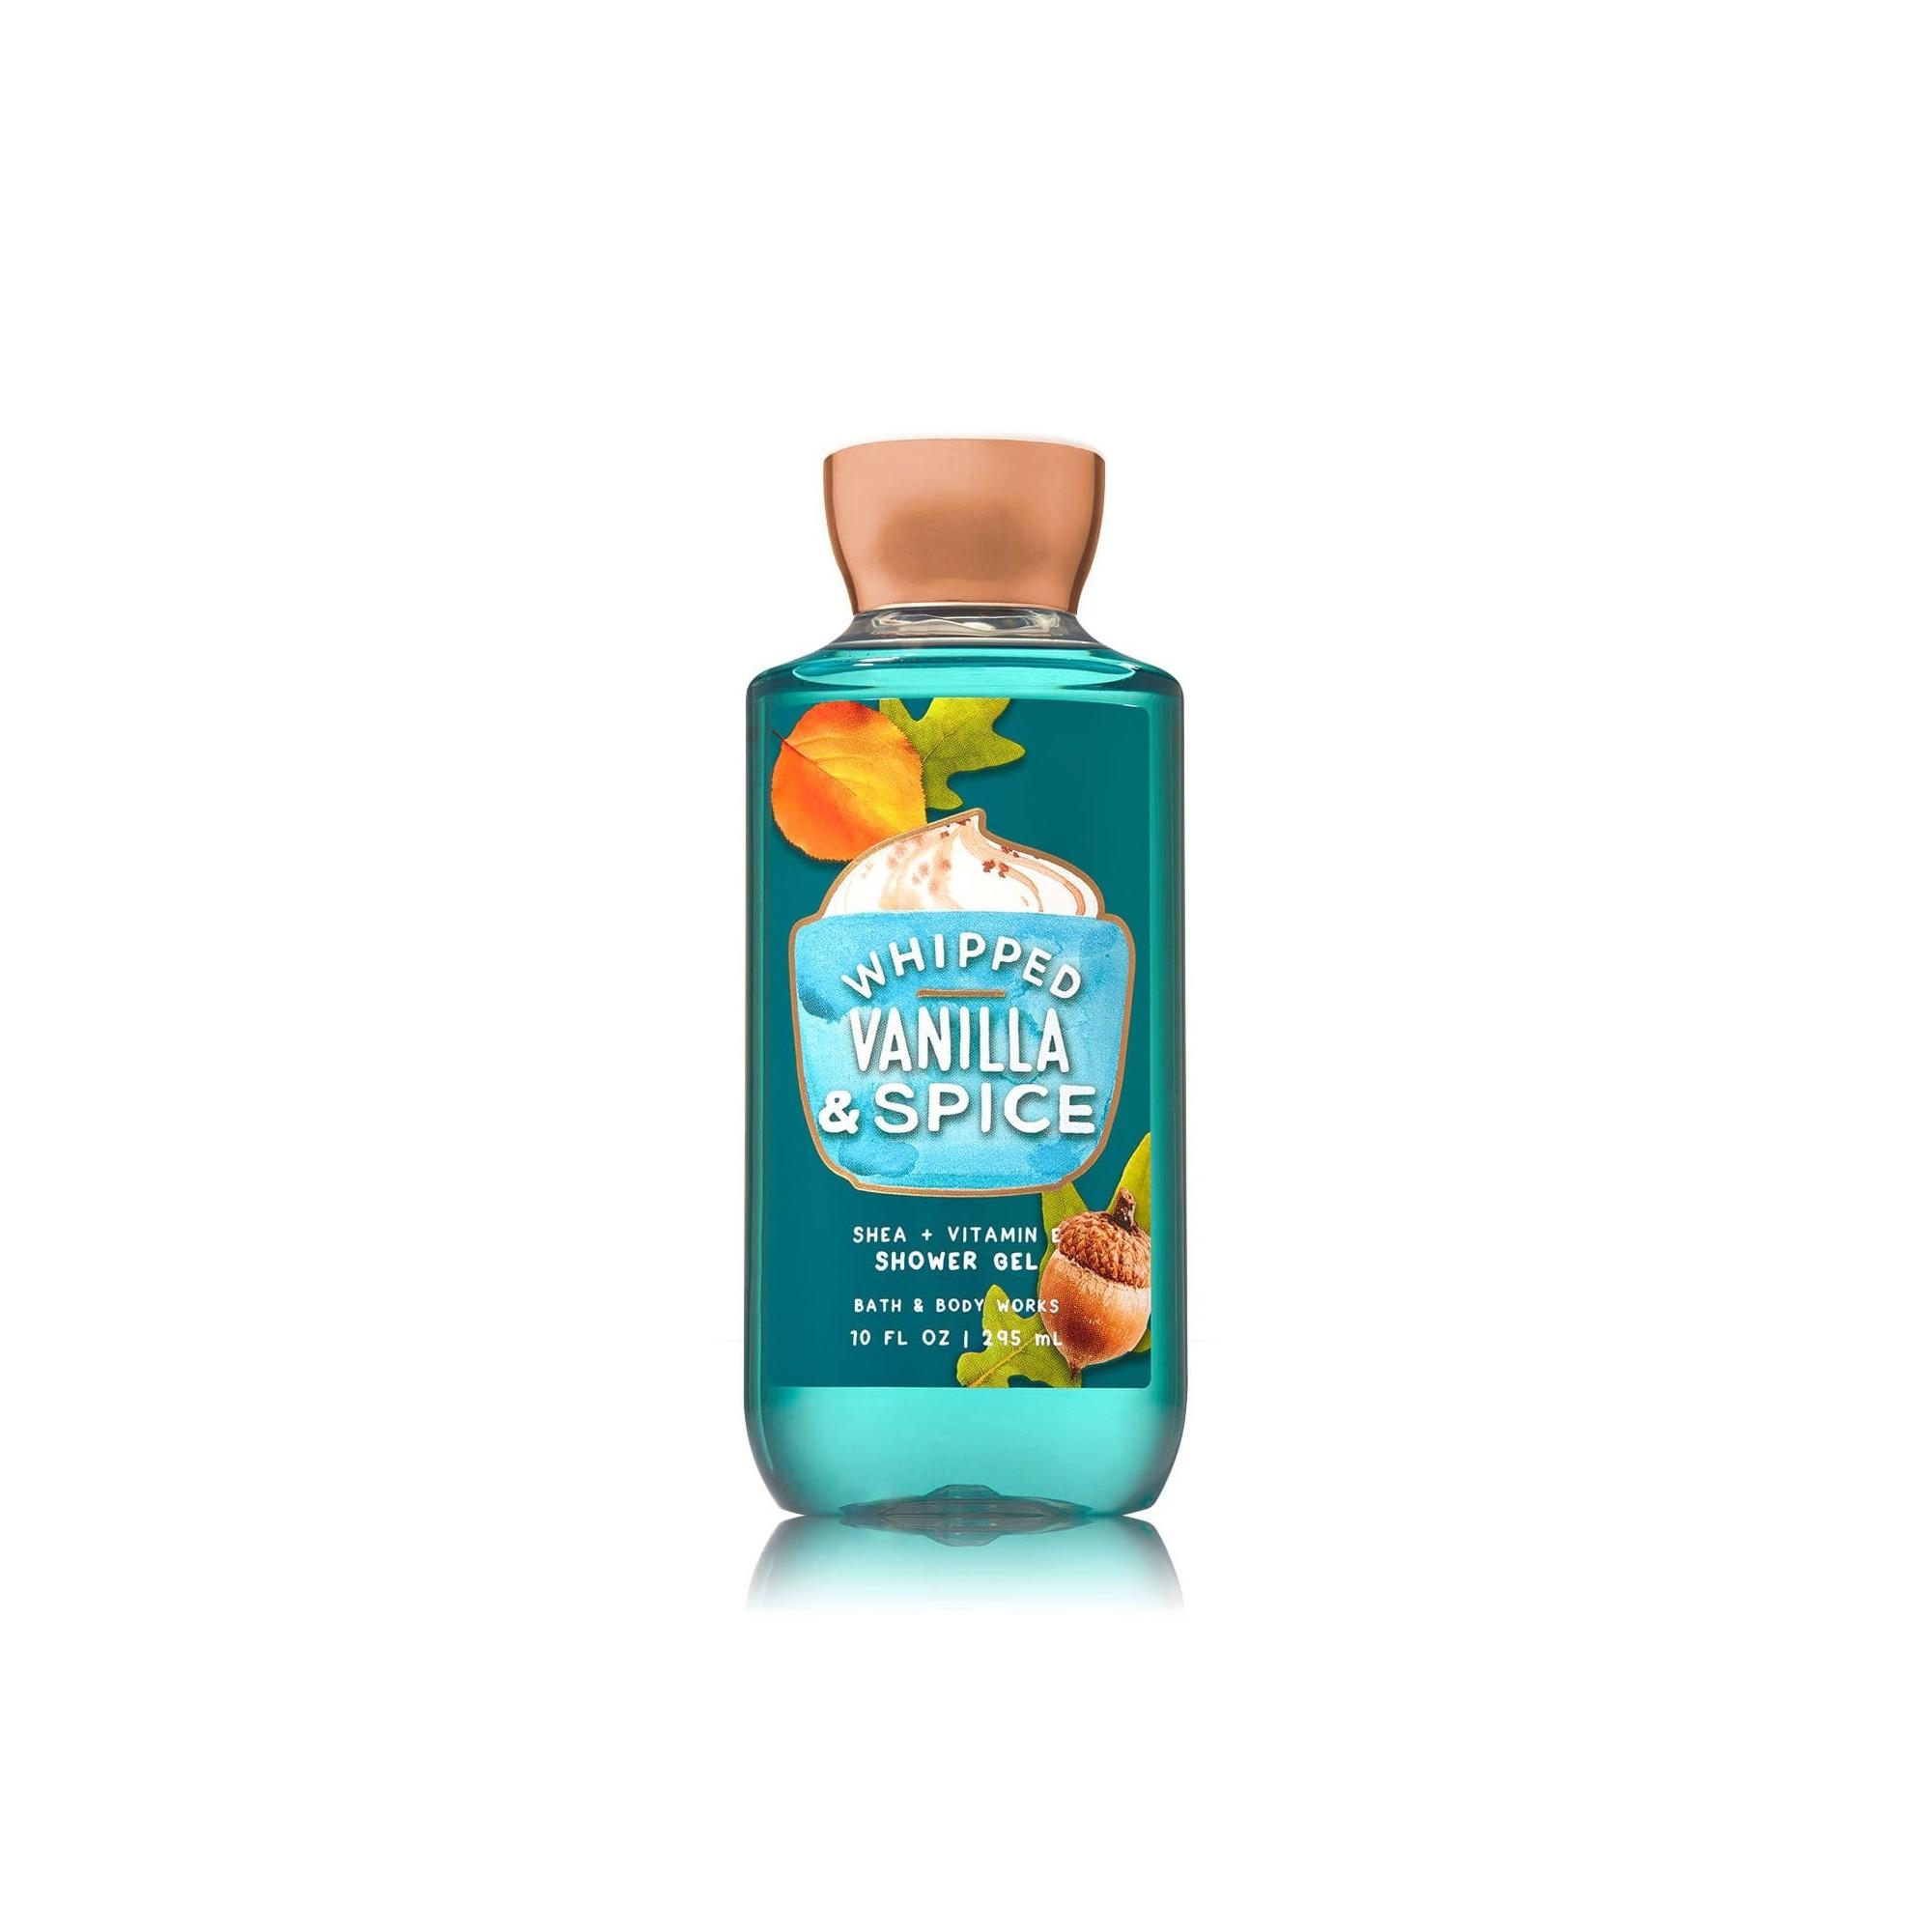 Bath & Body Works Whipped Vanilla & Spice Shower Gel